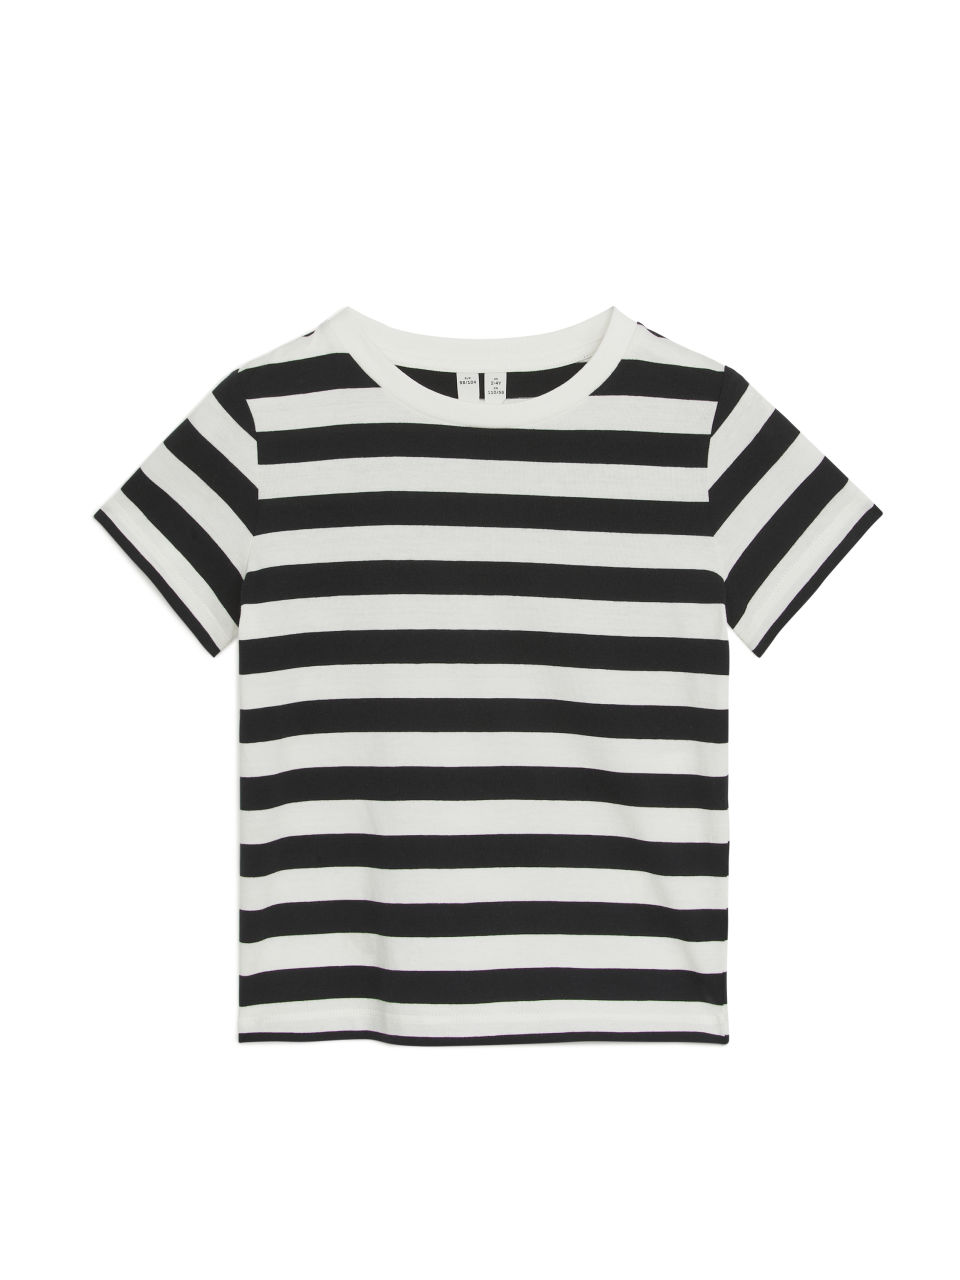 Striped T-Shirt - Black